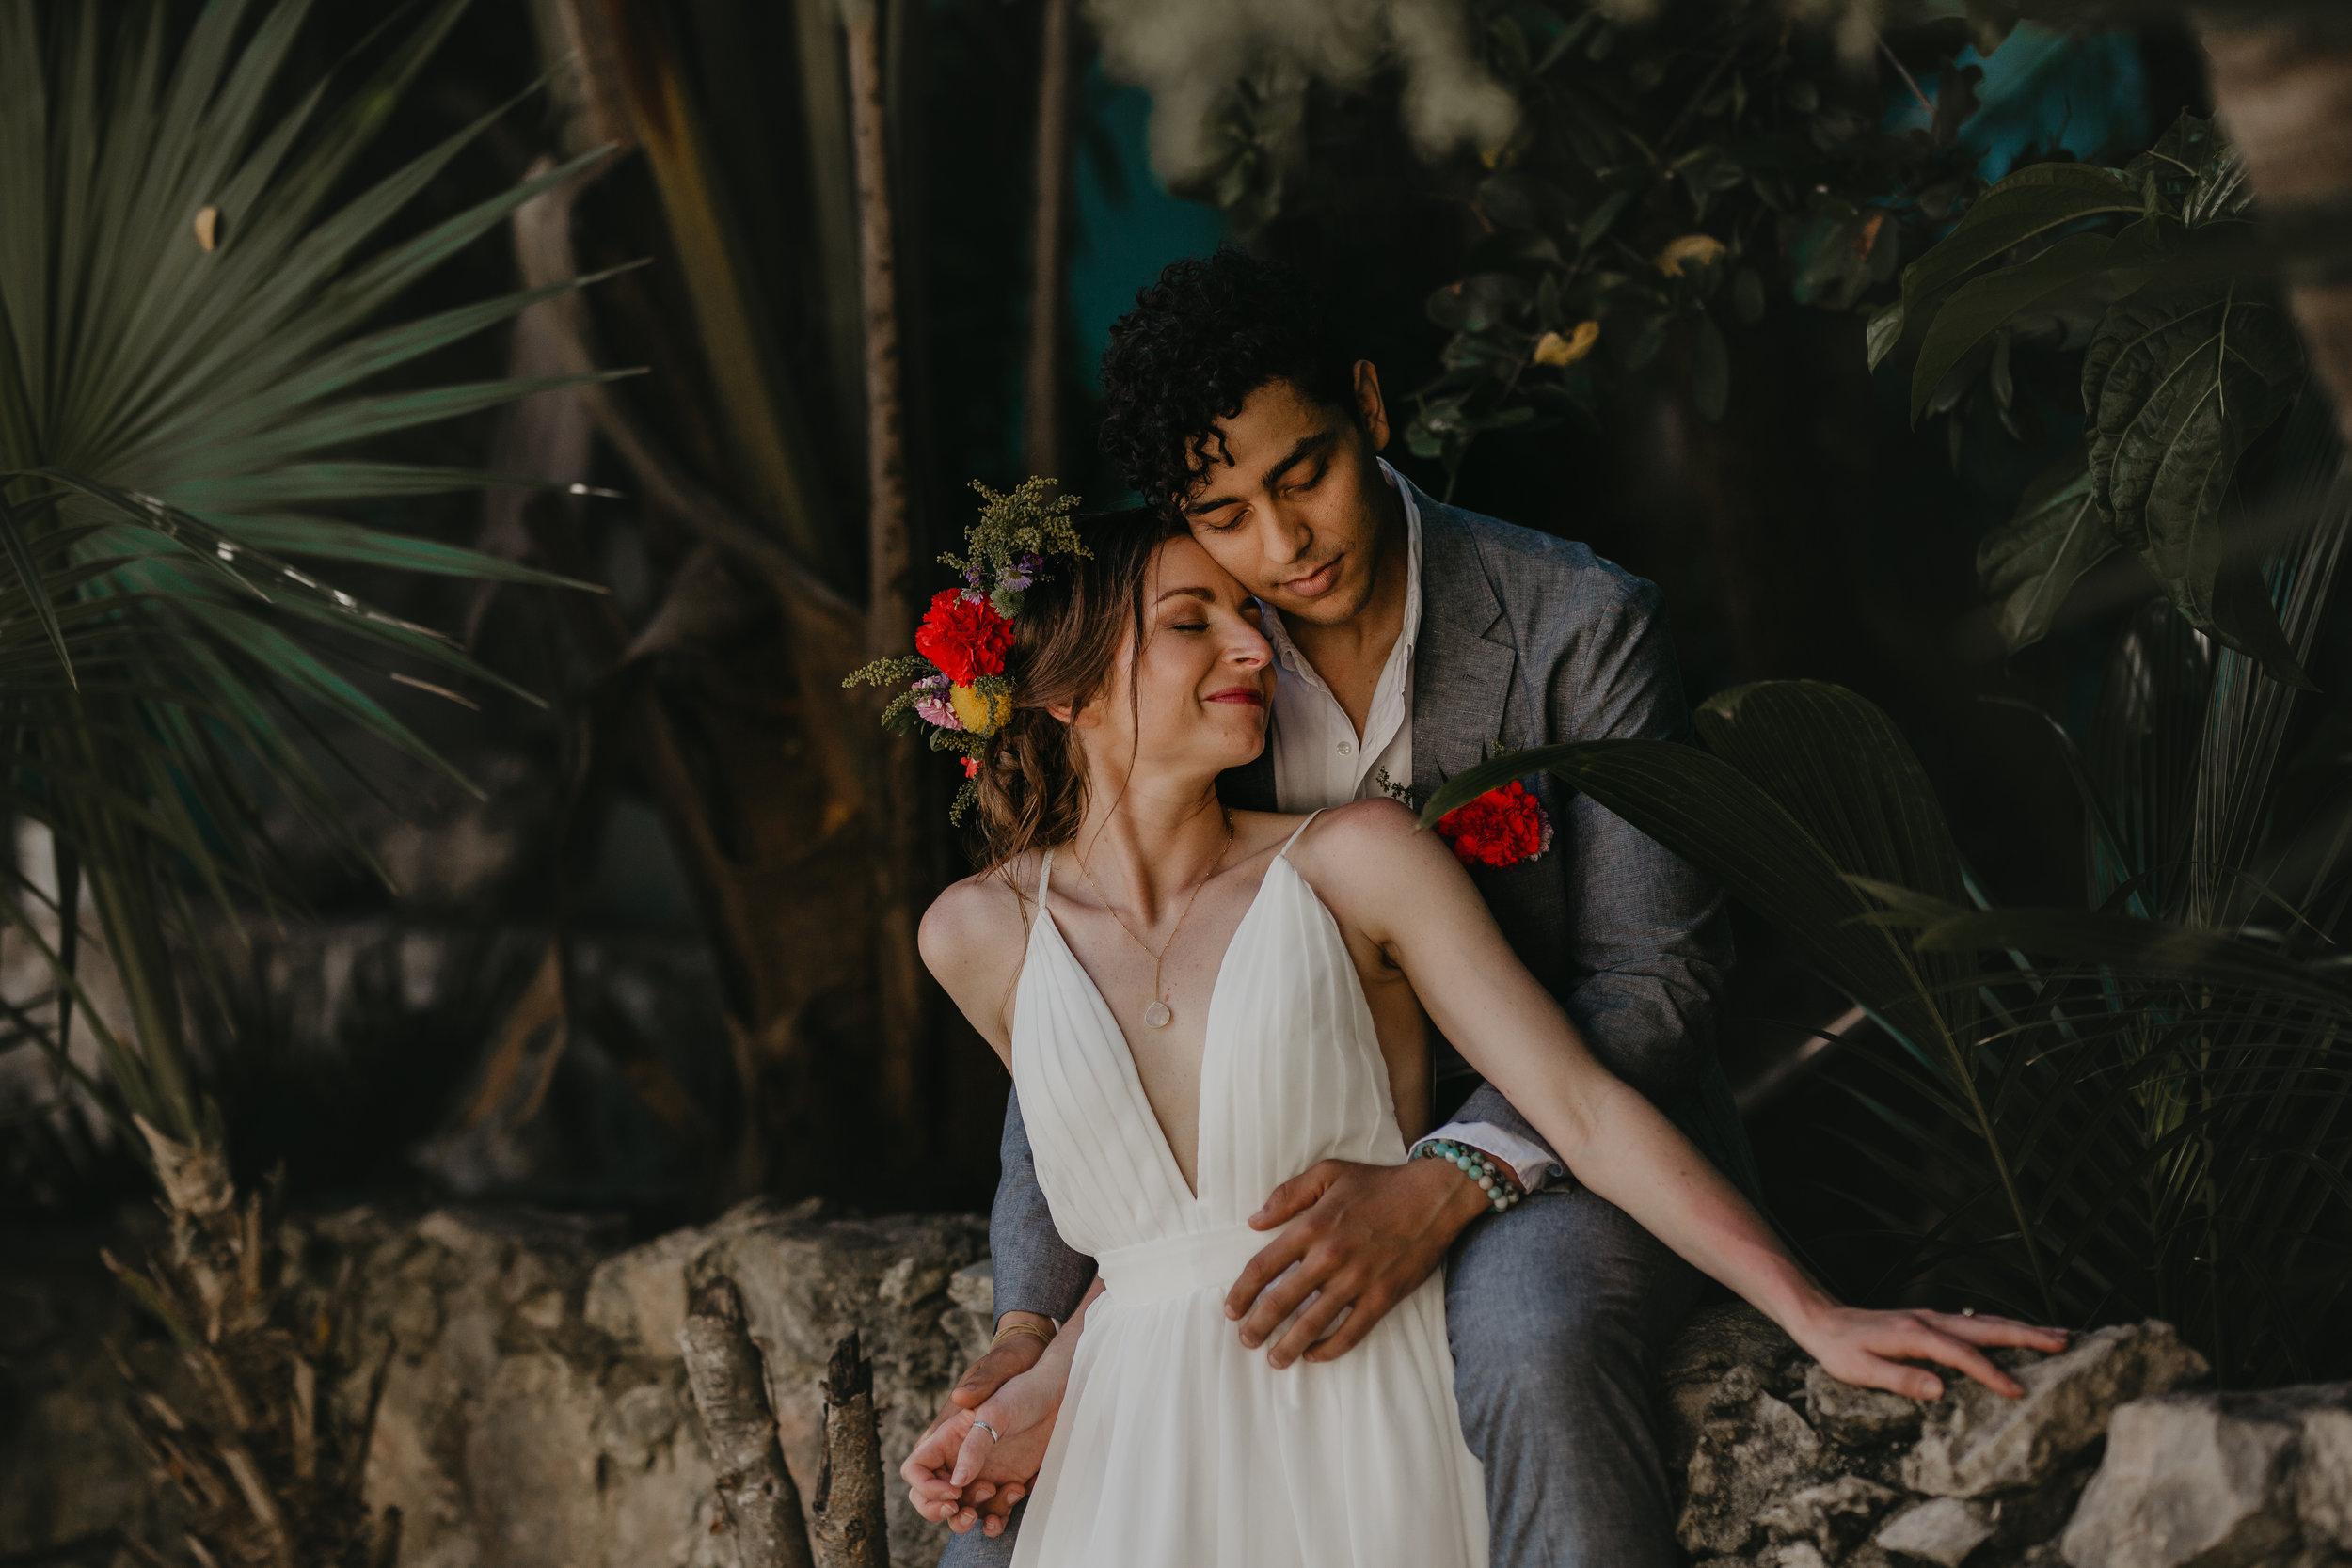 Nicole-Daacke-Photography-beachfront-akumal-destionation-wedding-tulum-mexico-elopement-photographer-destination-wedding-inspiration-sunset-champagne-pop-boho-bride-ocean-tropical-bohemian-tulum-wedding-photos-135.jpg